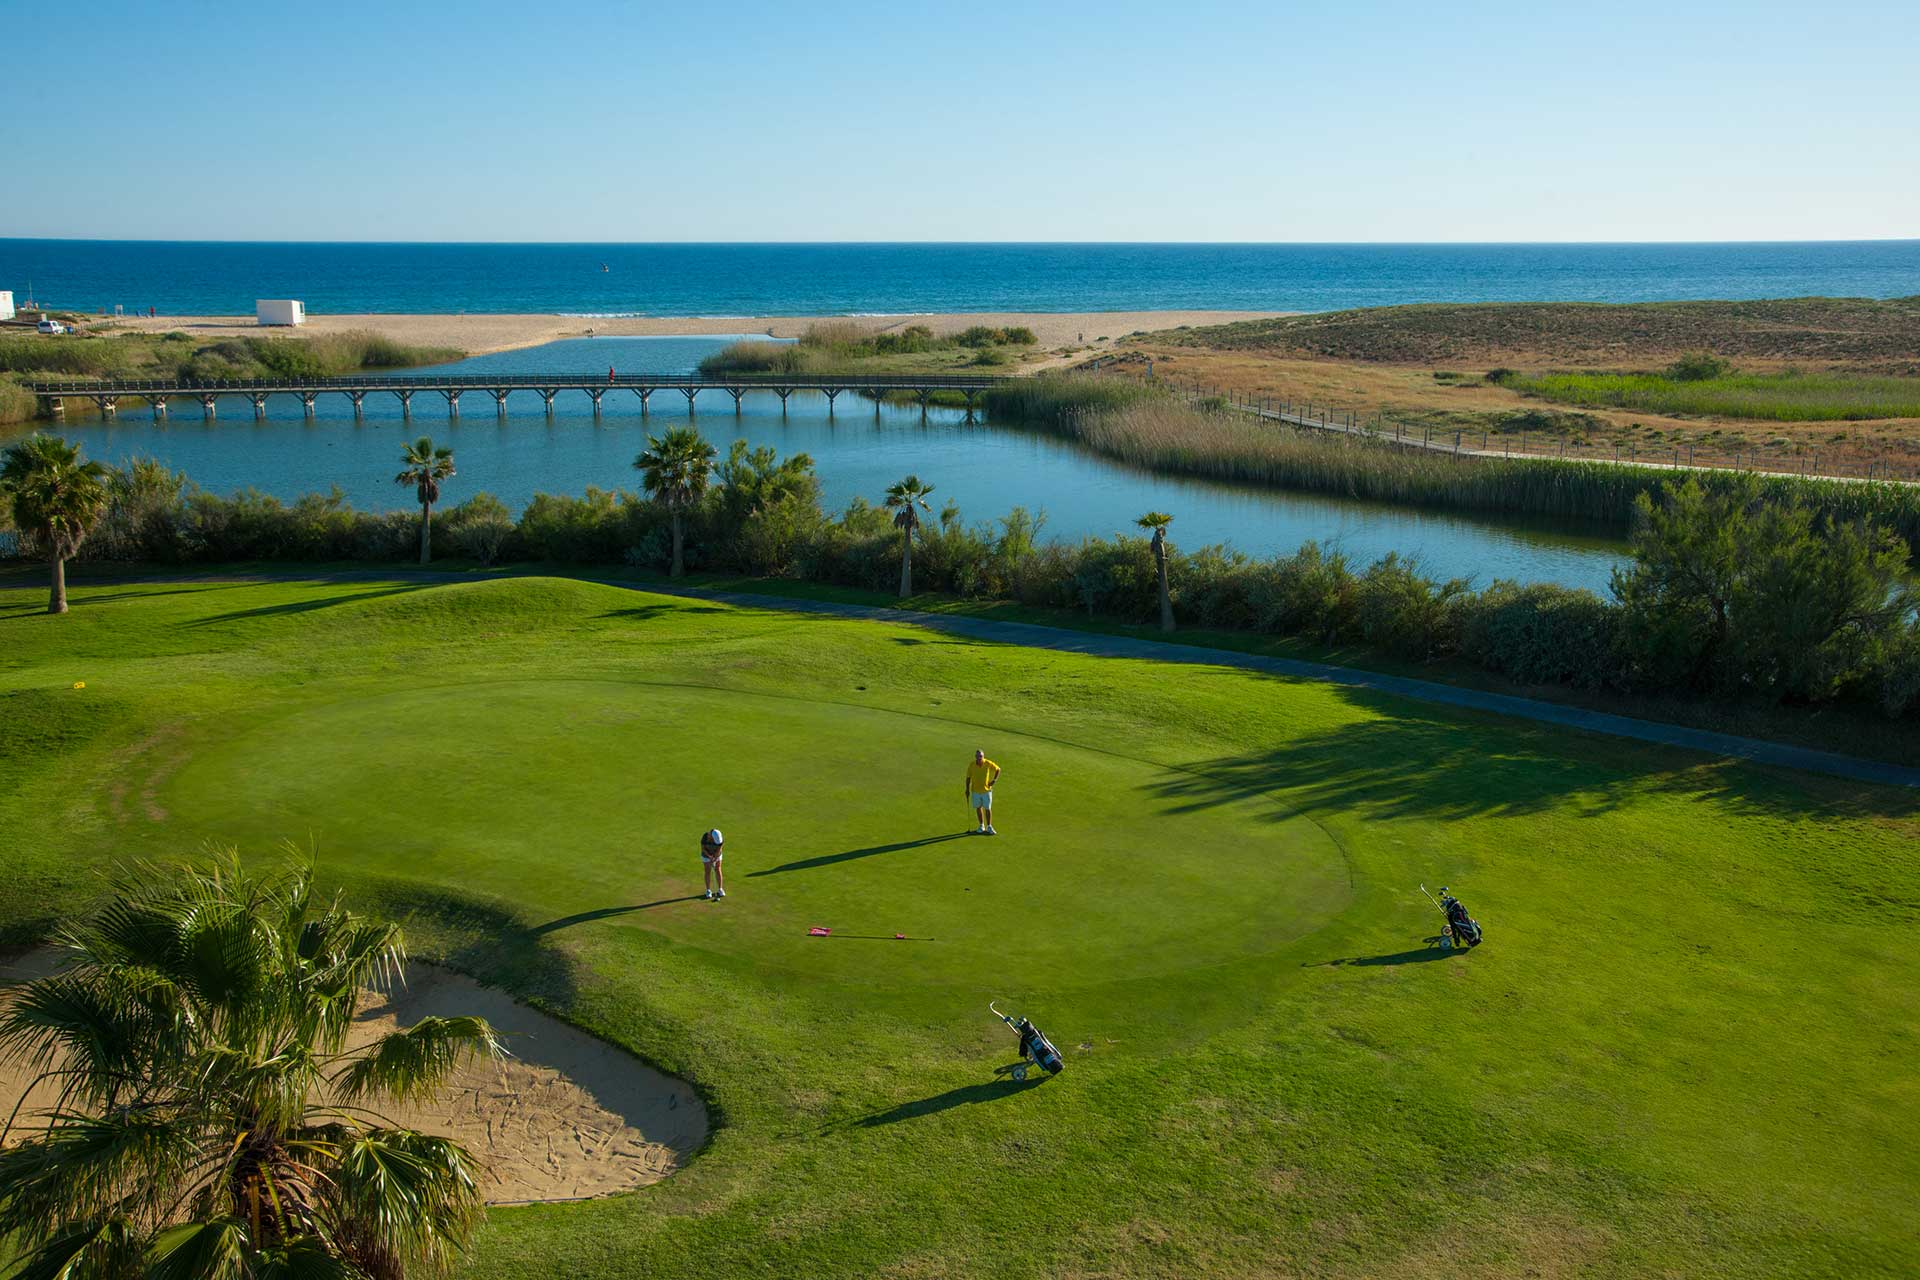 Golf-expedition-golfreizen-golfresort-Morgado-Golf-&-Country-Club-golf-course-hole-12